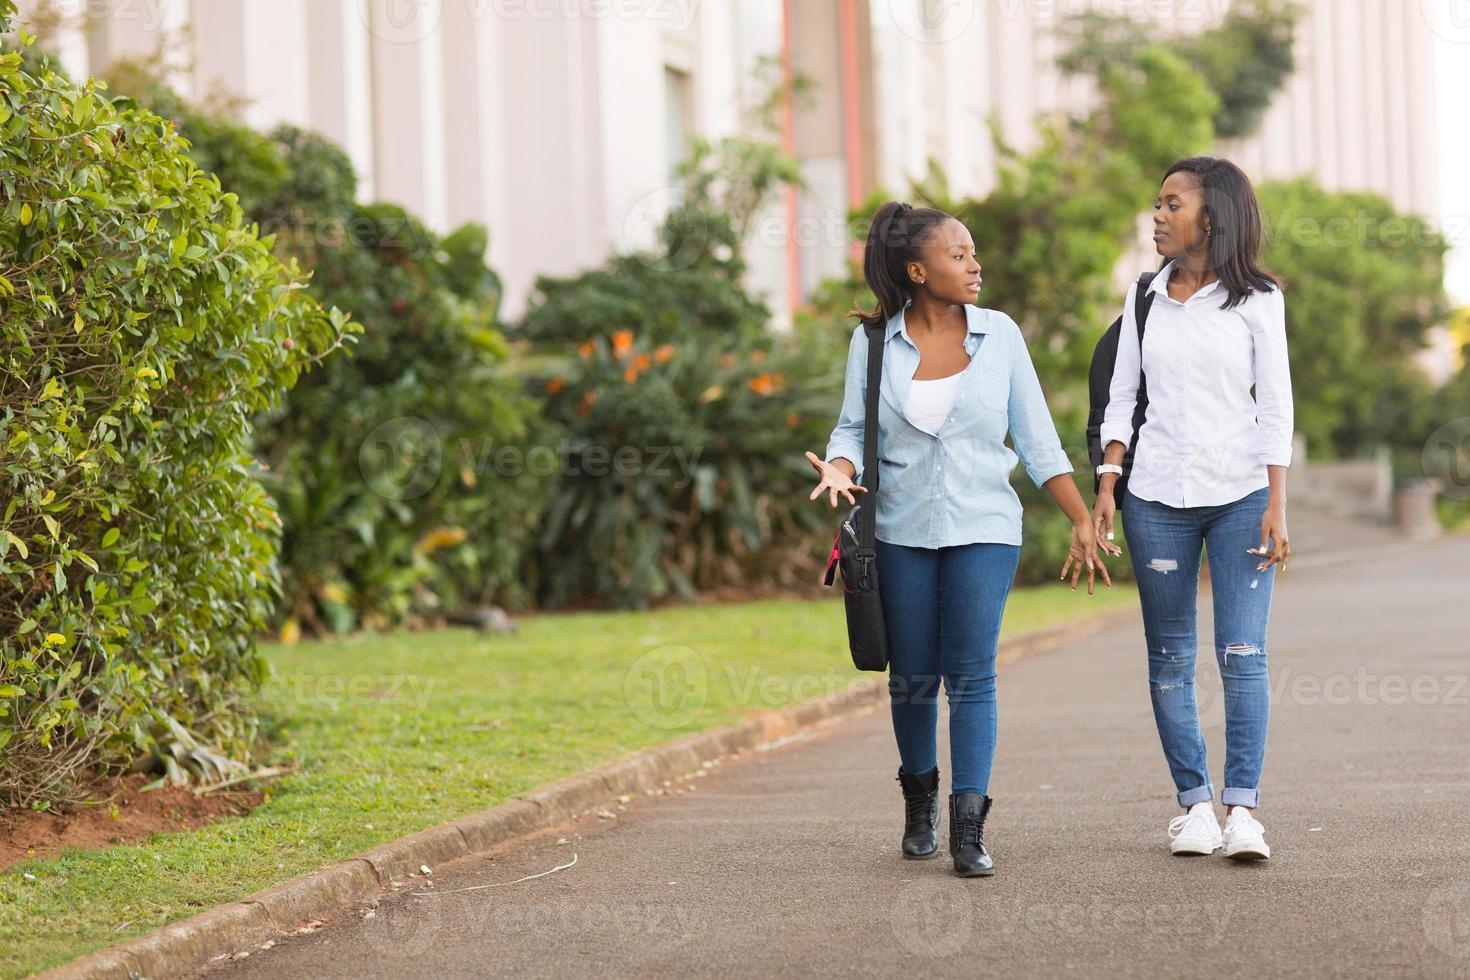 studenti universitari africani che camminano insieme foto